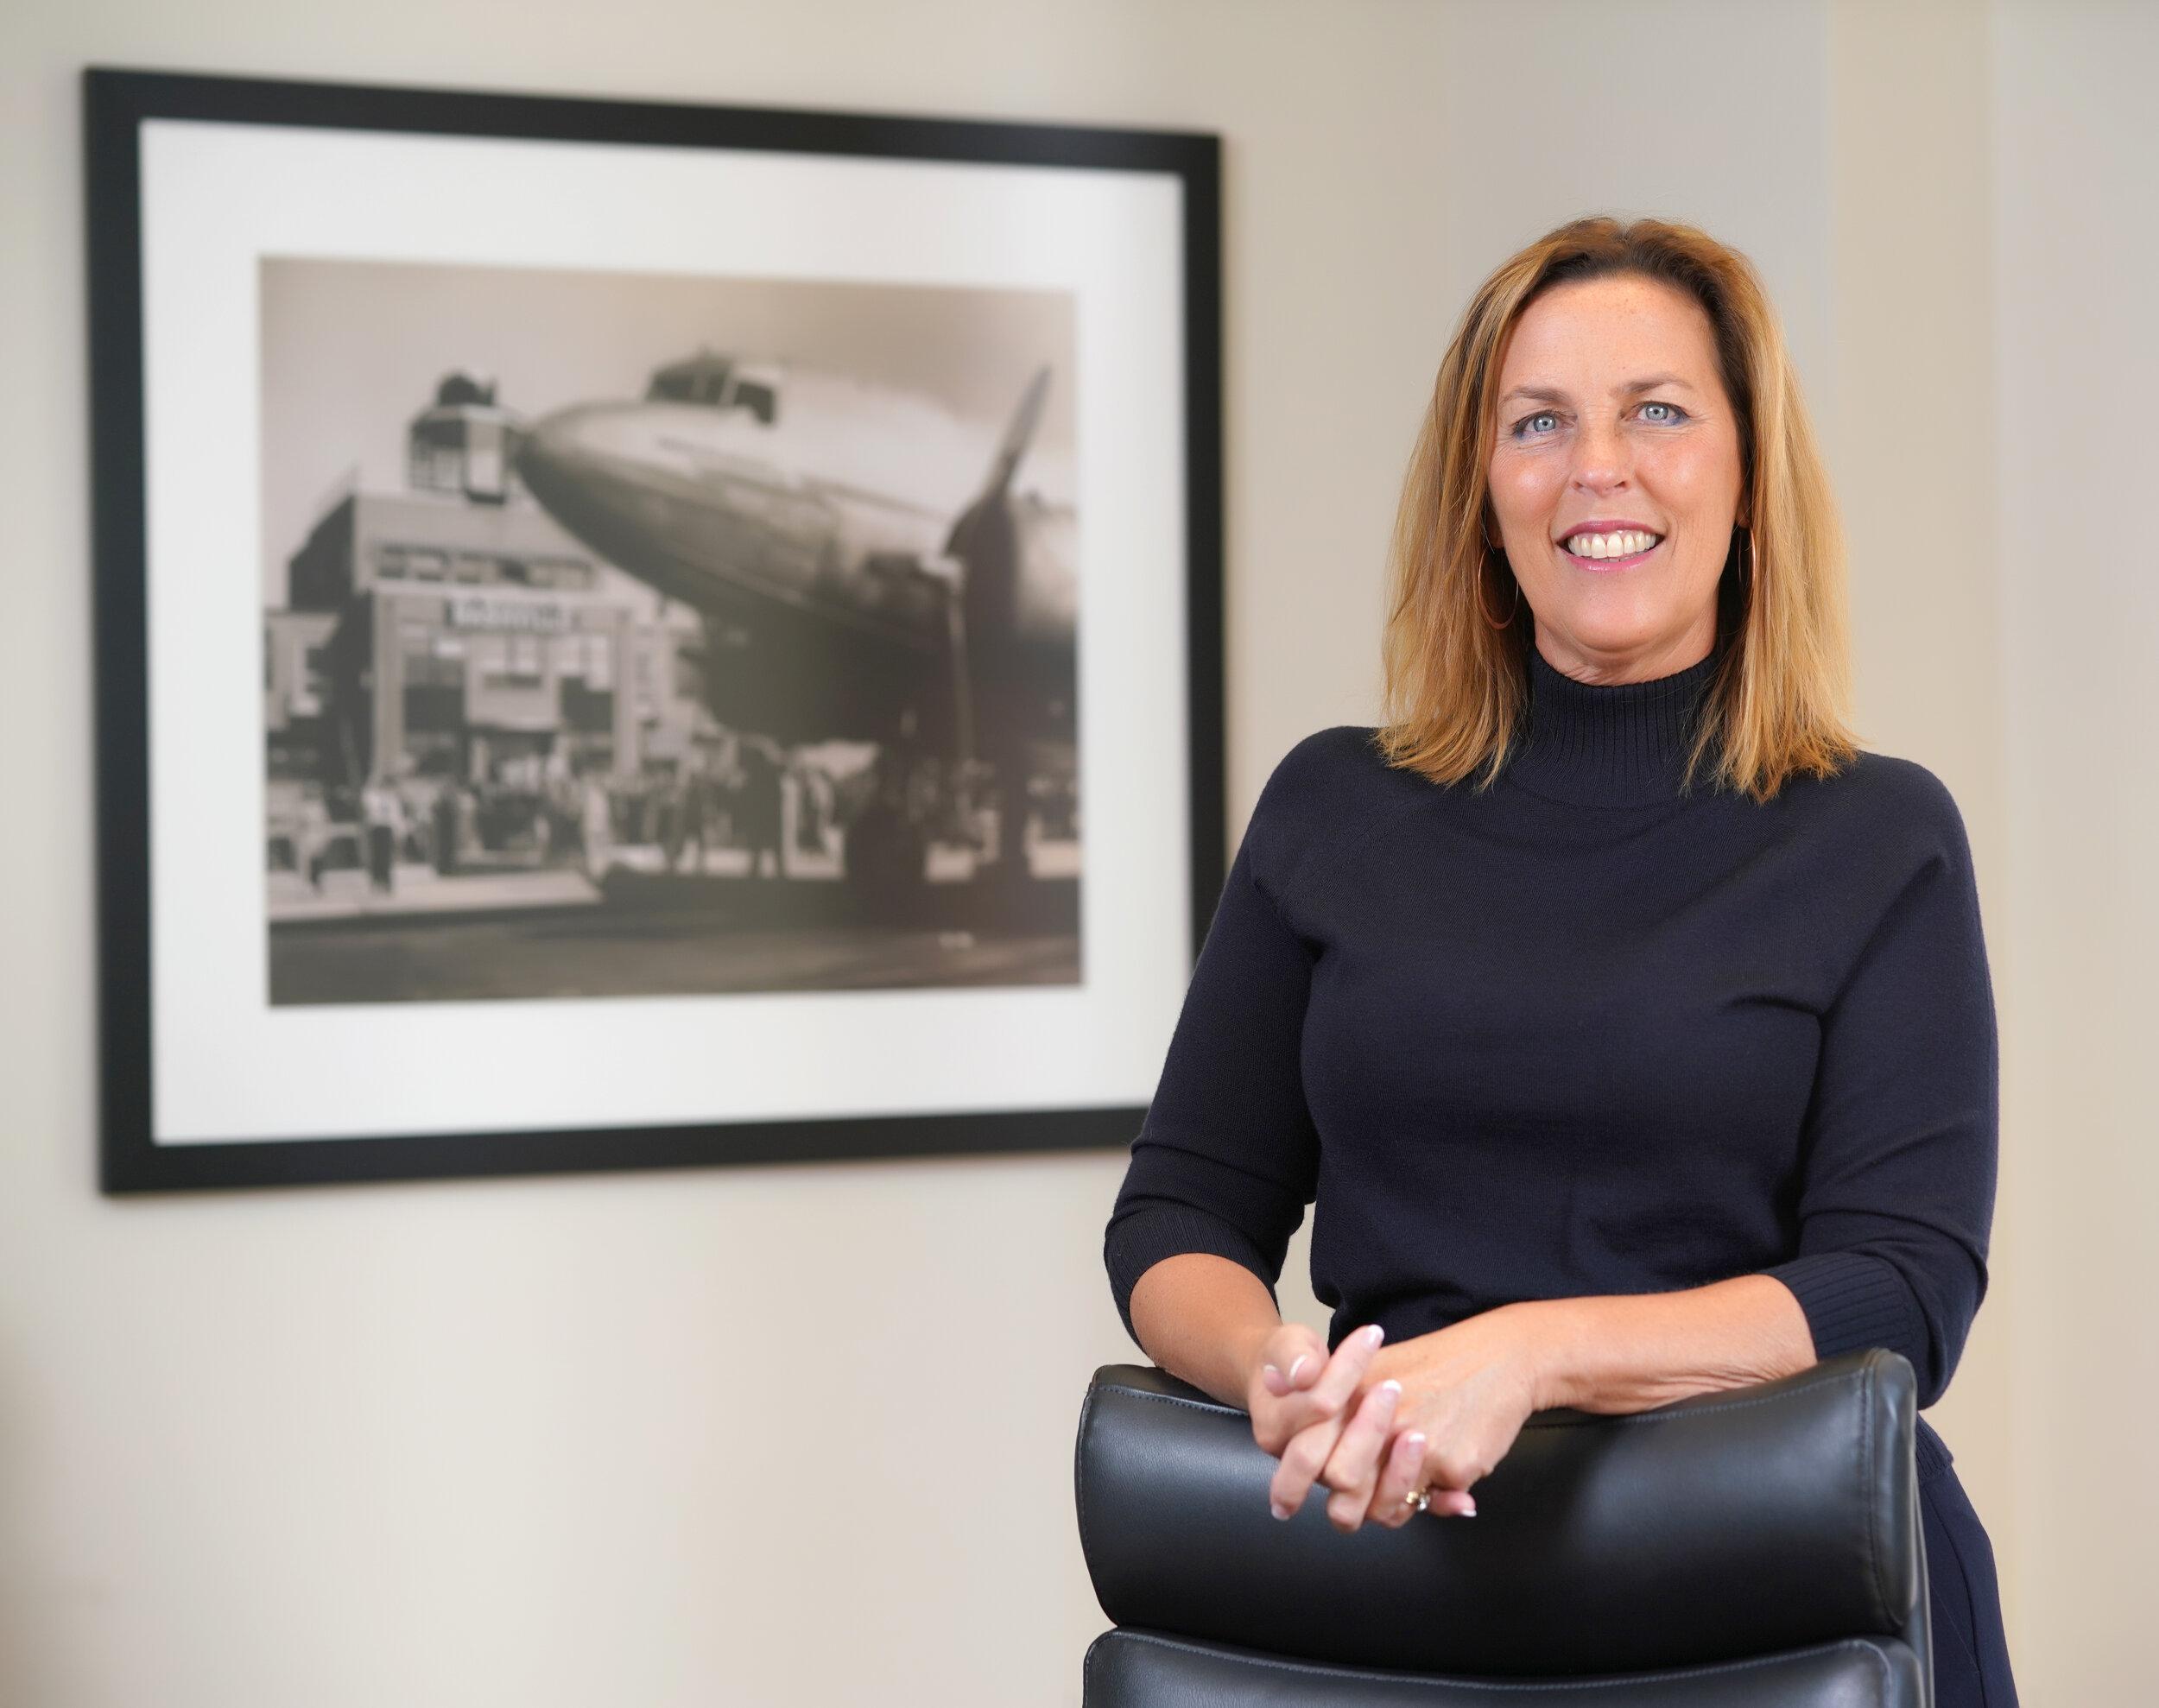 Jane H. Allen, incoming CEO of The Nashville Entrepreneur Center